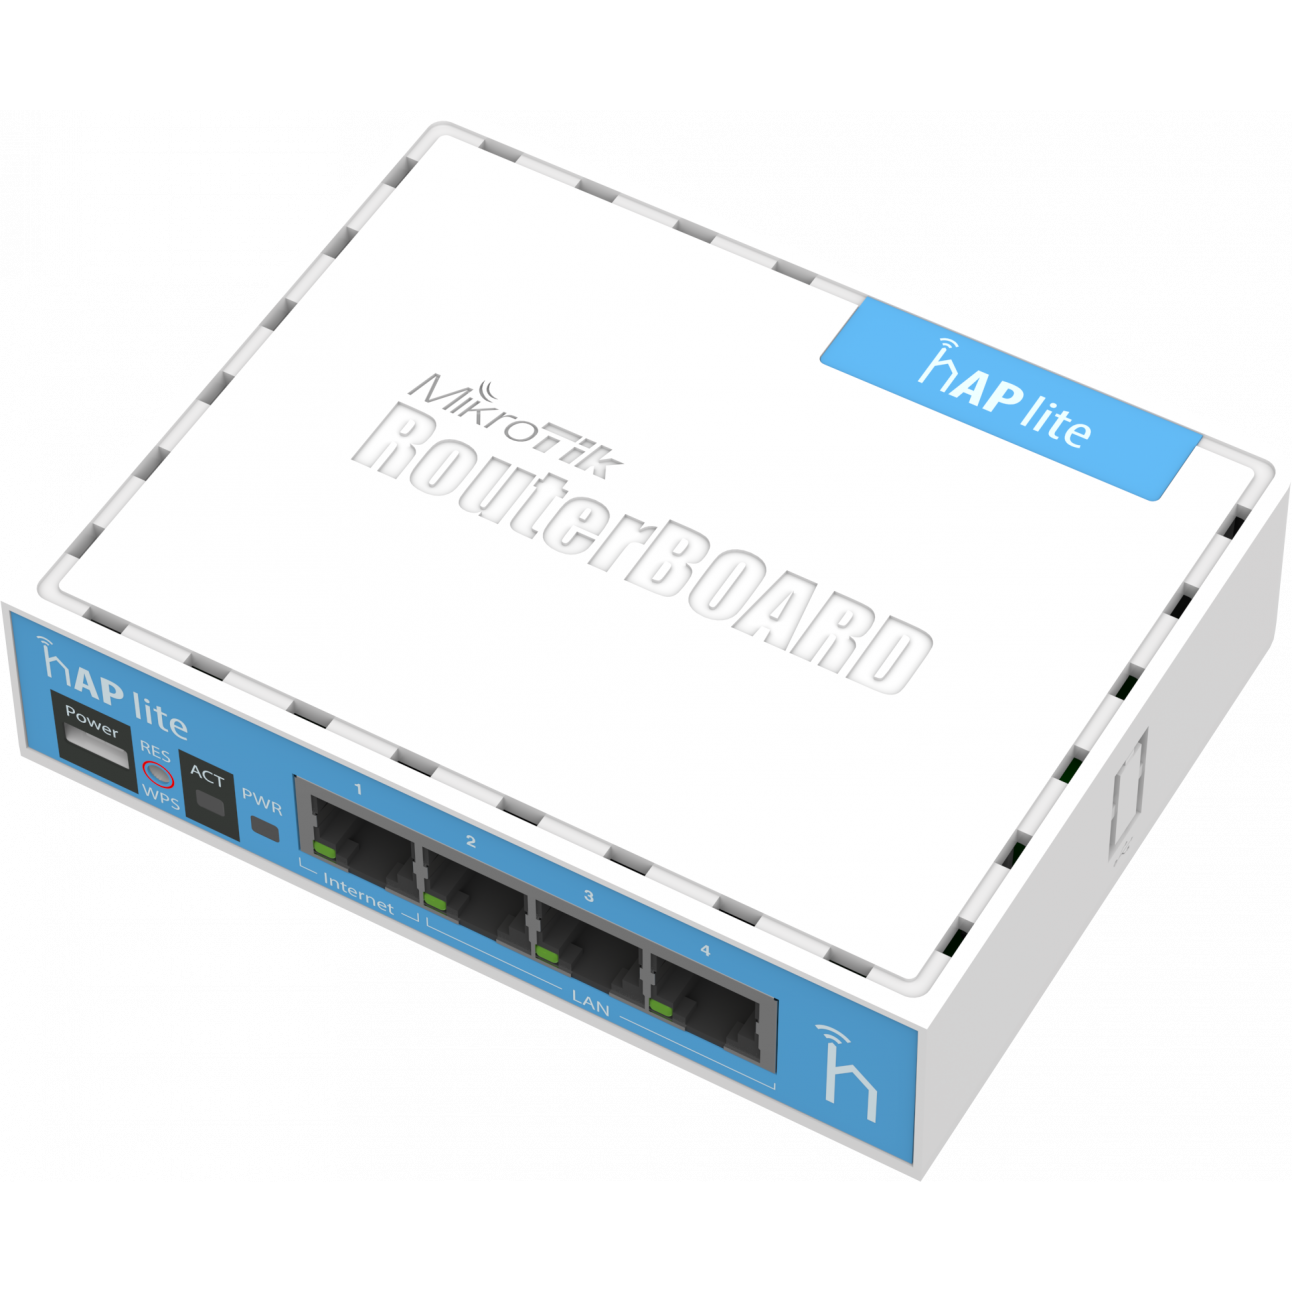 Беспроводной маршрутизатор Mikrotik hAP lite (RouterOS L4)